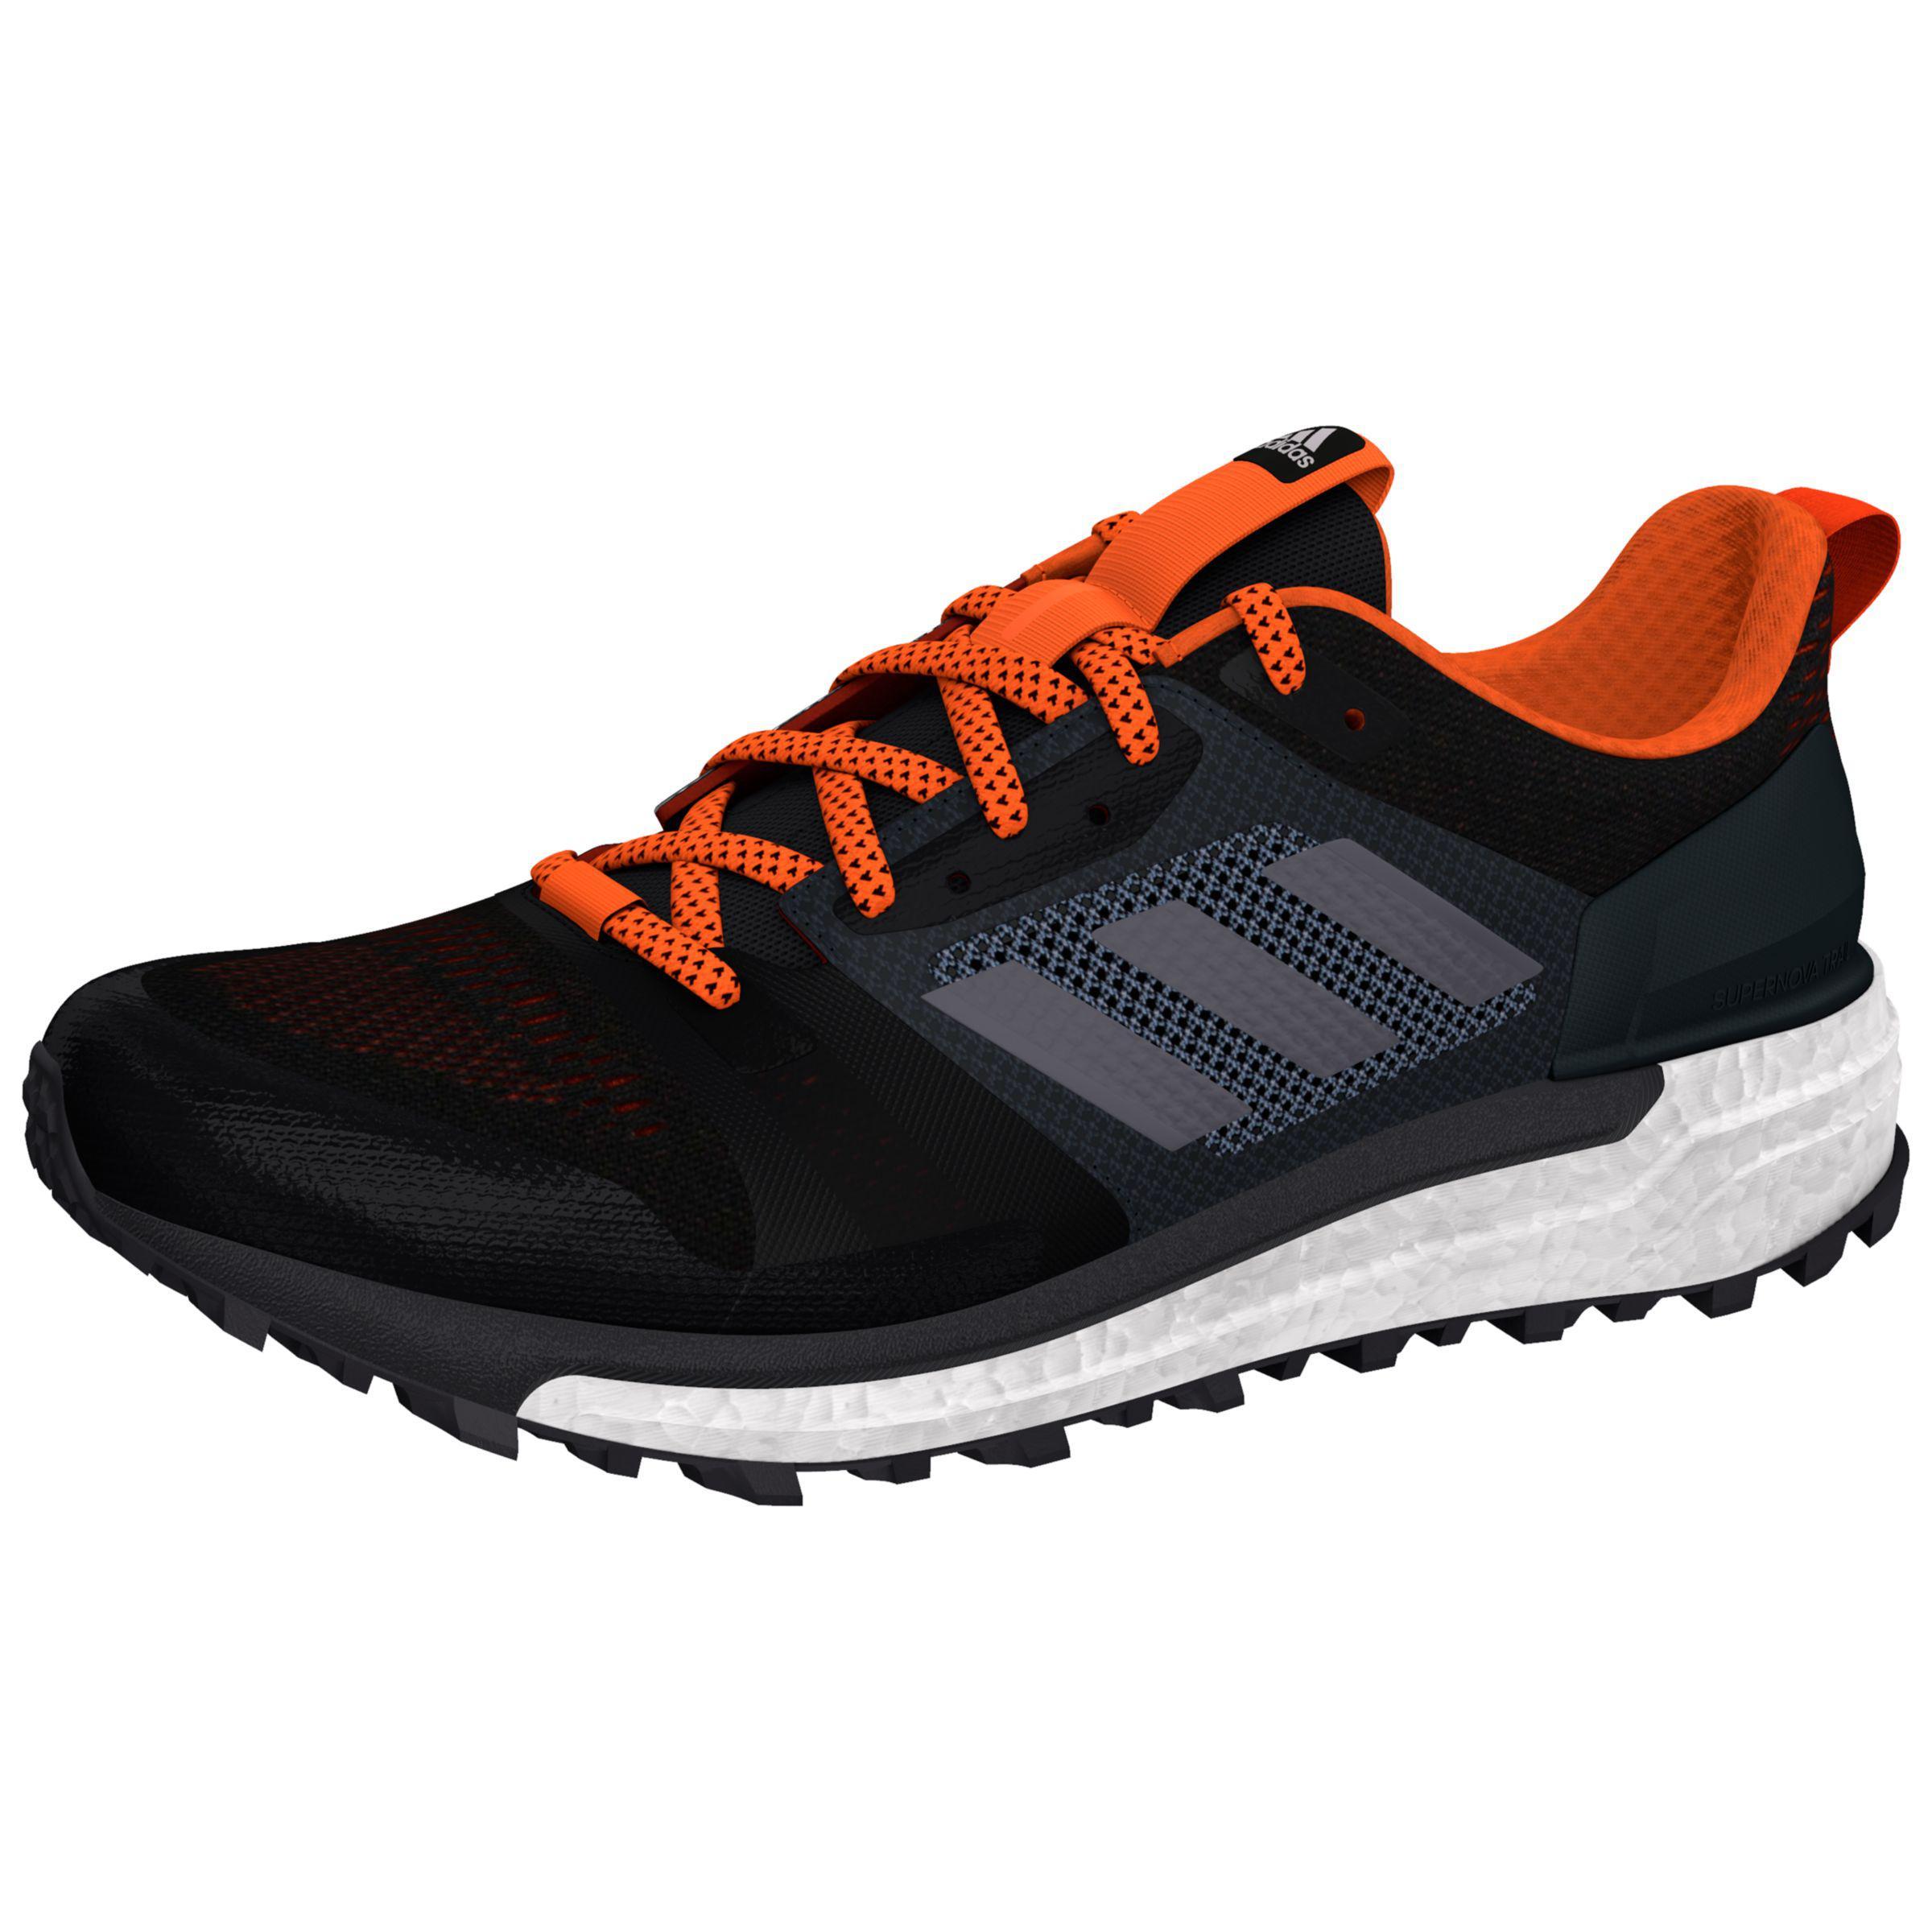 48d6cd5cc Adidas Black Supernova Trial Men's Running Shoes for men